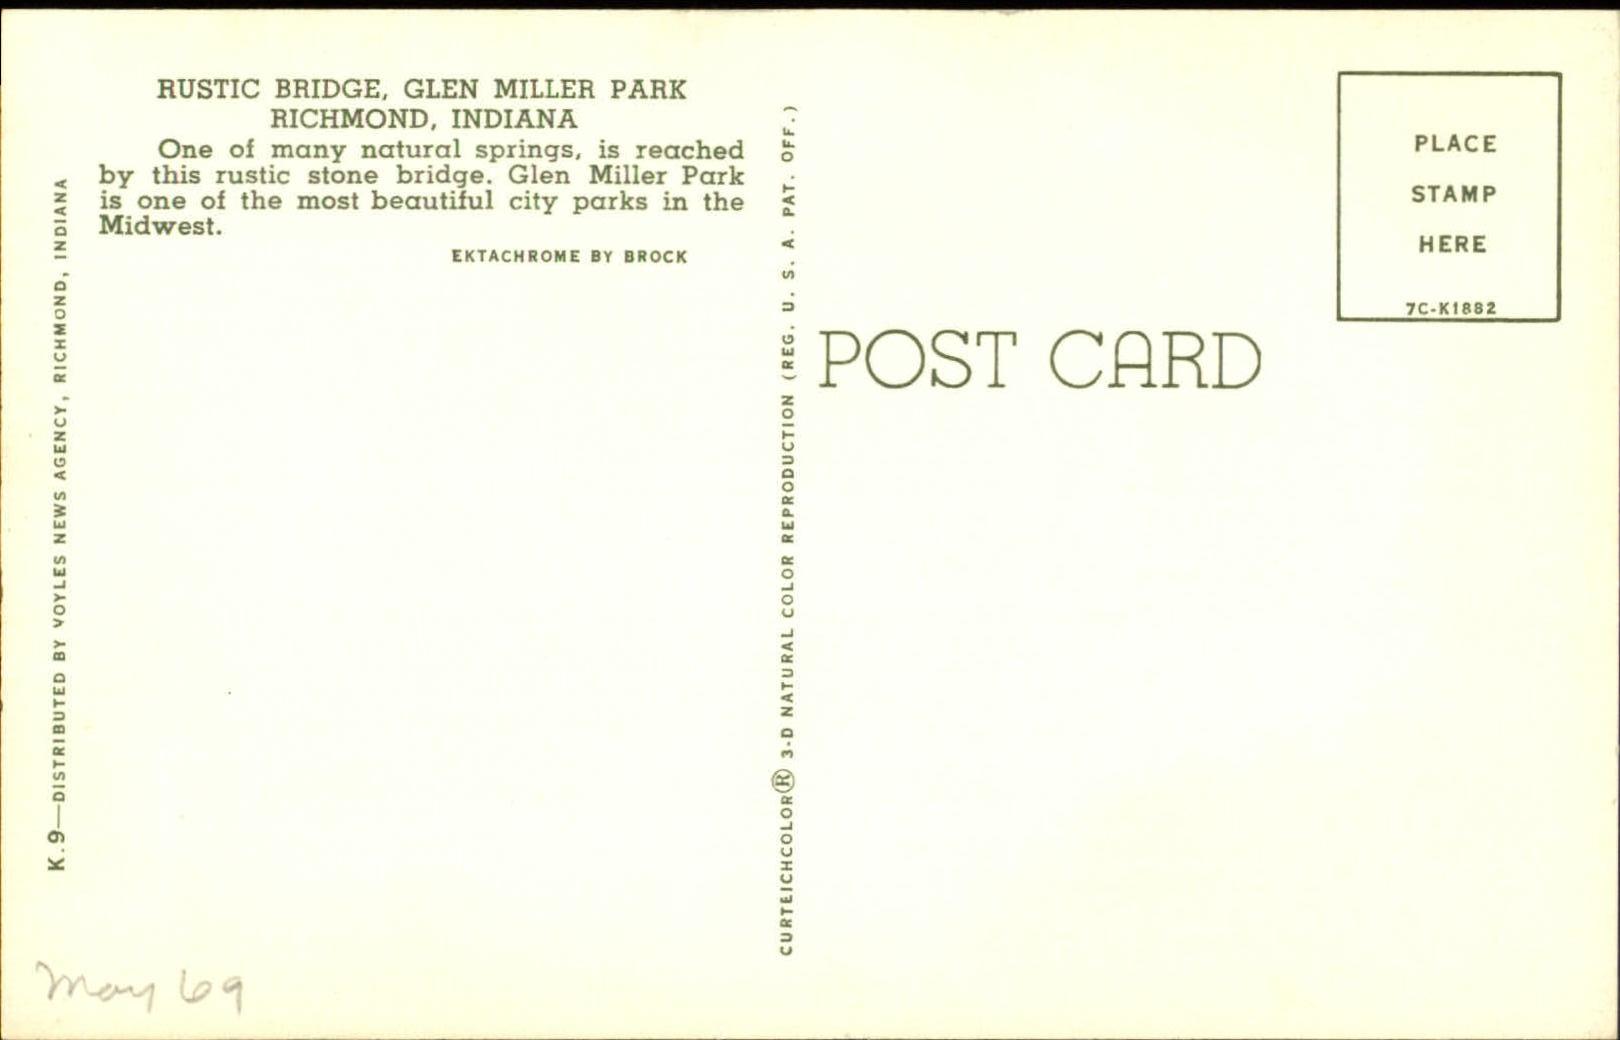 Rustic-stone-arch-bridge-Glen-Miller-Park-Richmond-Indiana-1960s-postcard thumbnail 2